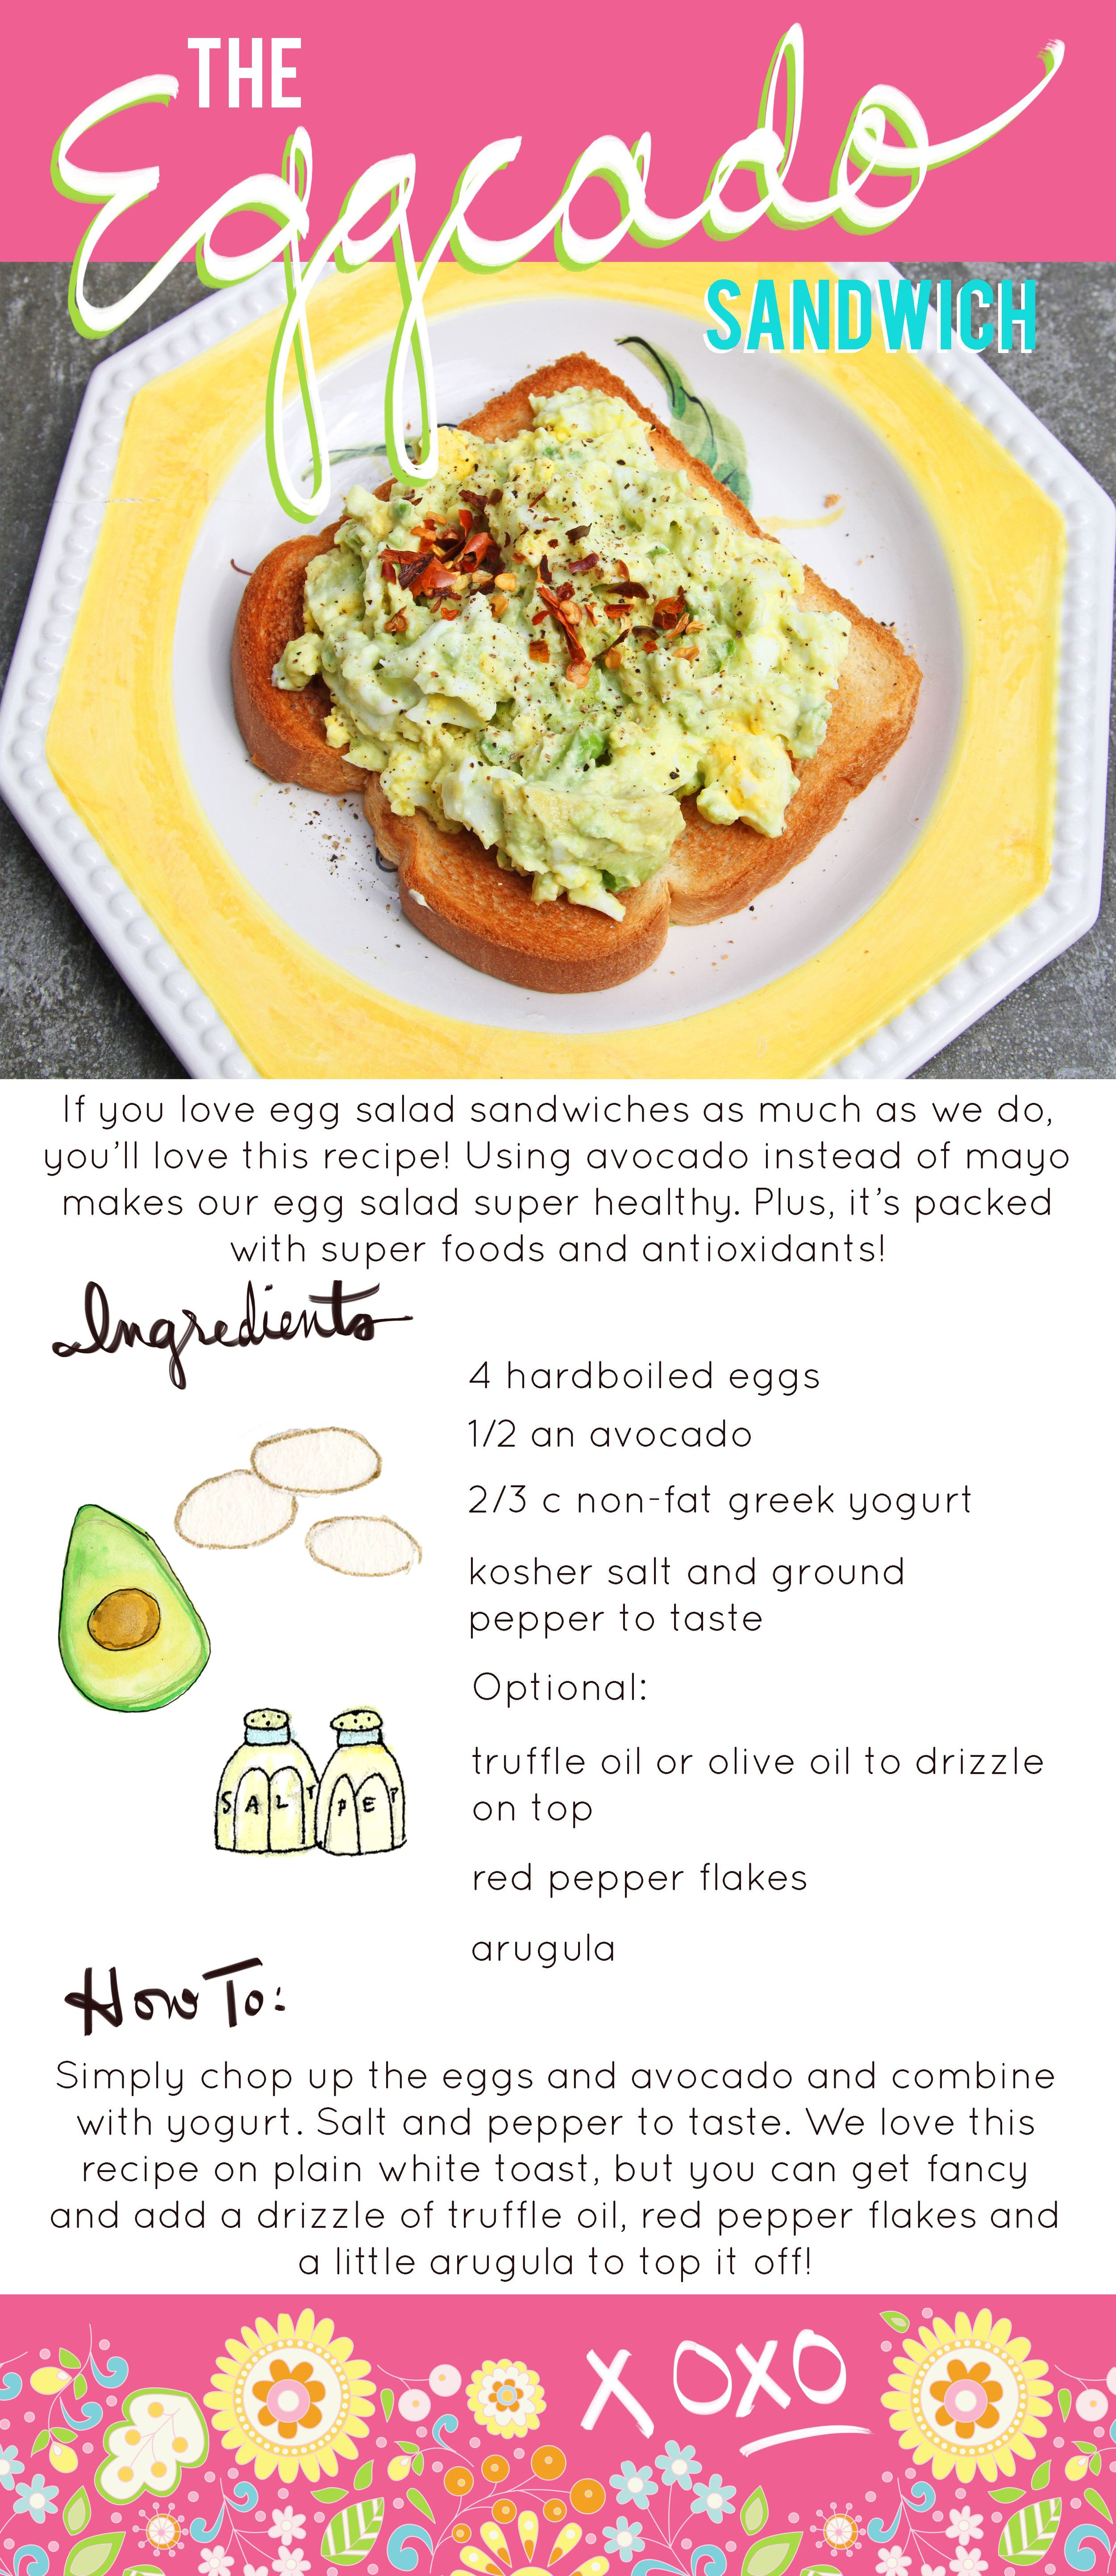 Eggcado Sandwich